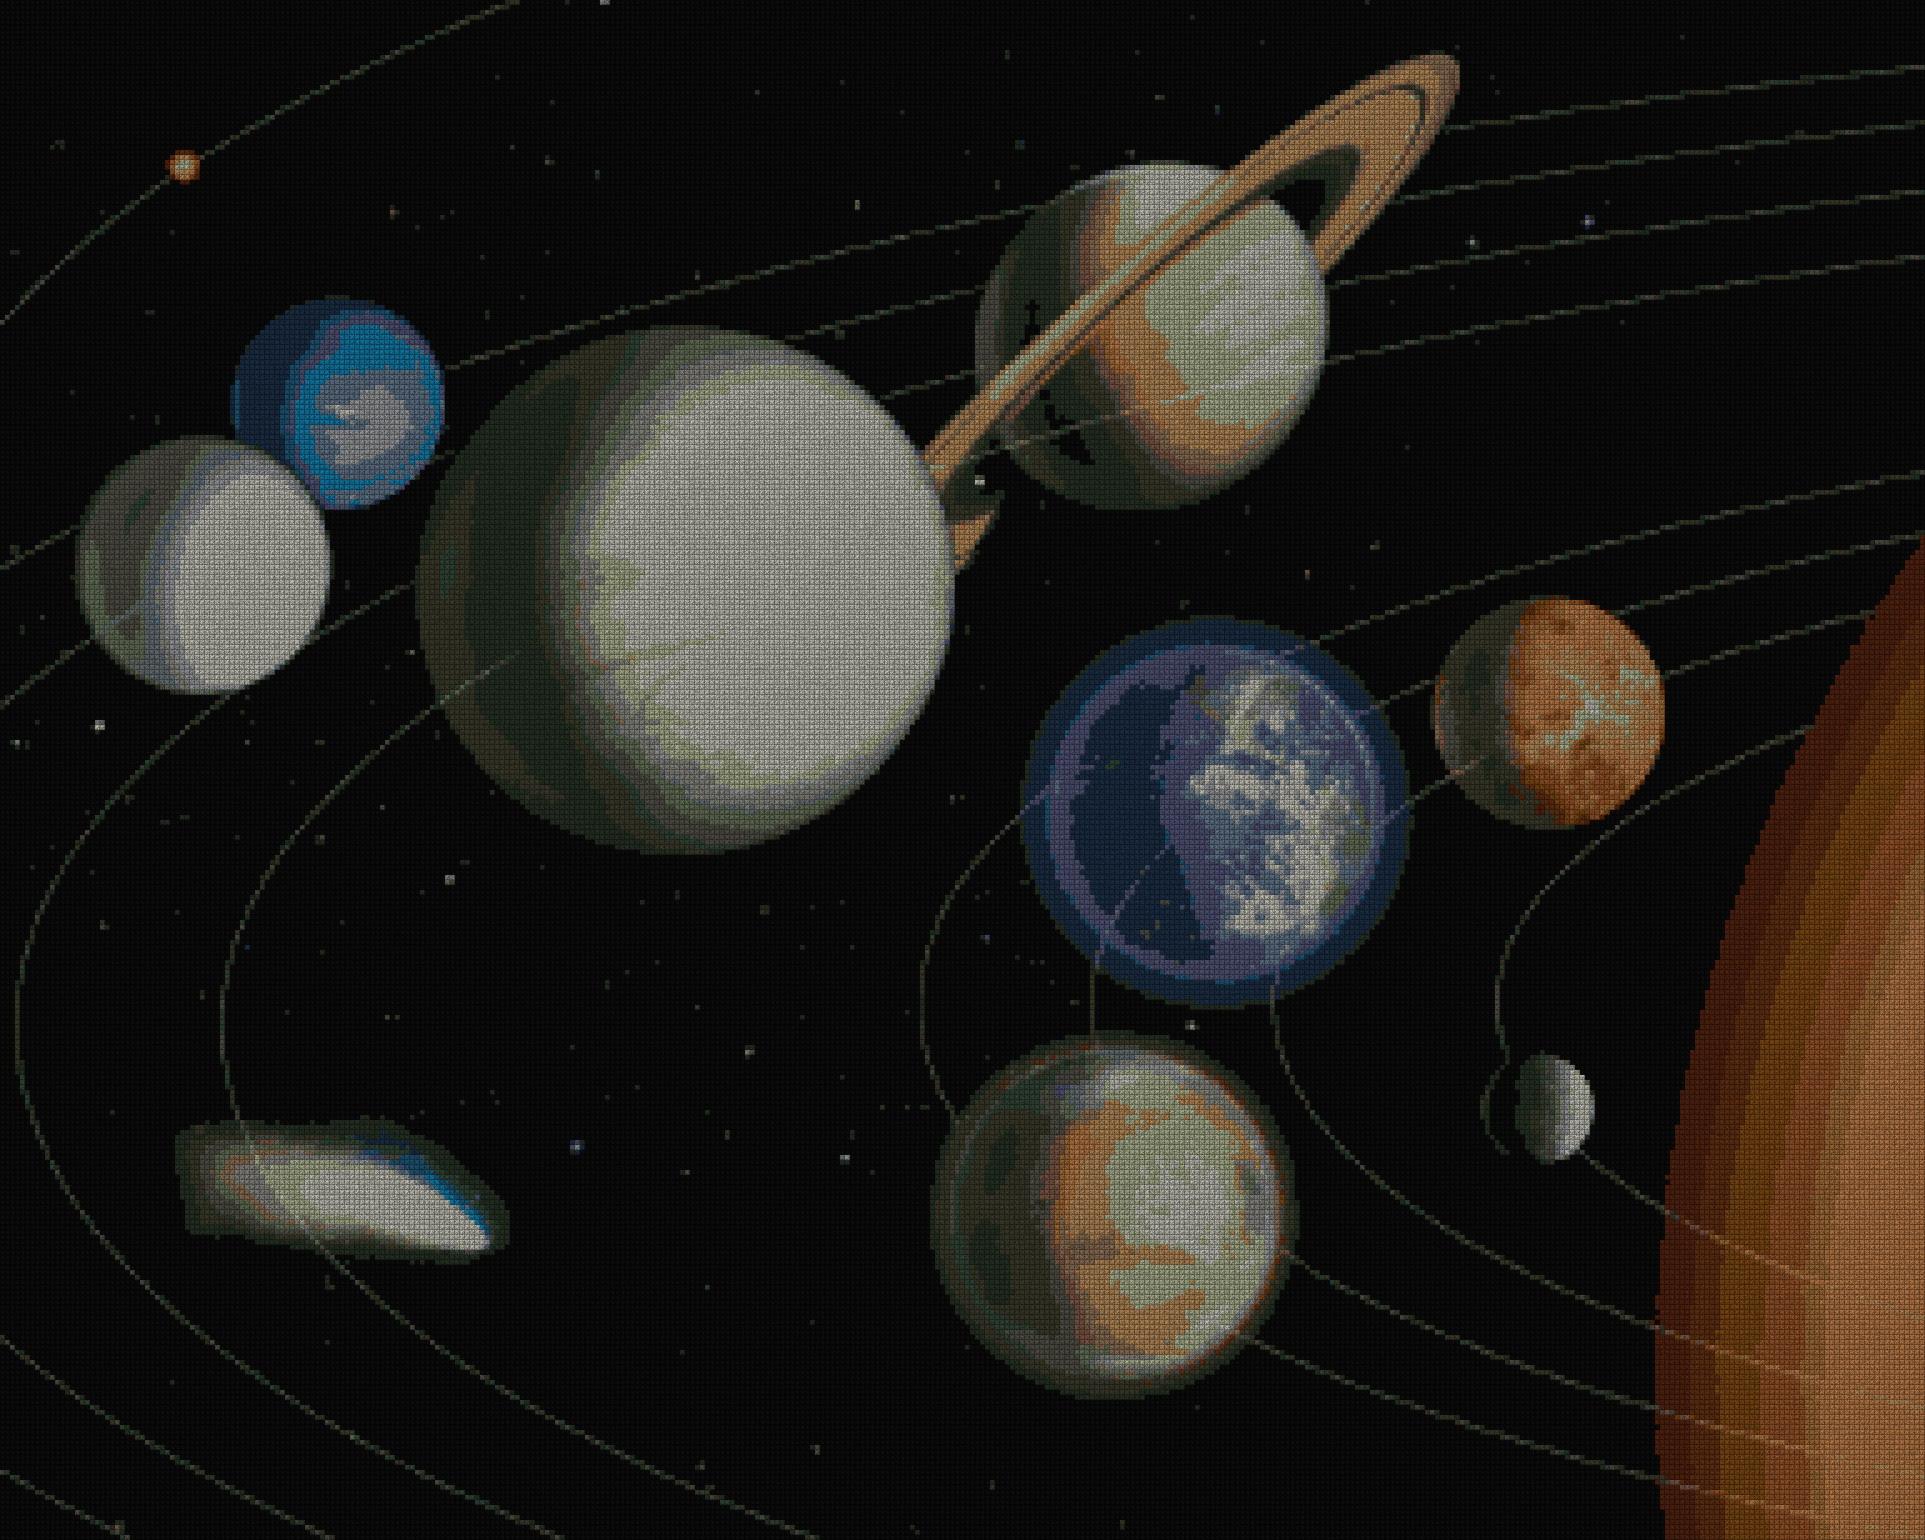 schemi_misti/misti/sistema_solare_385x308.jpg